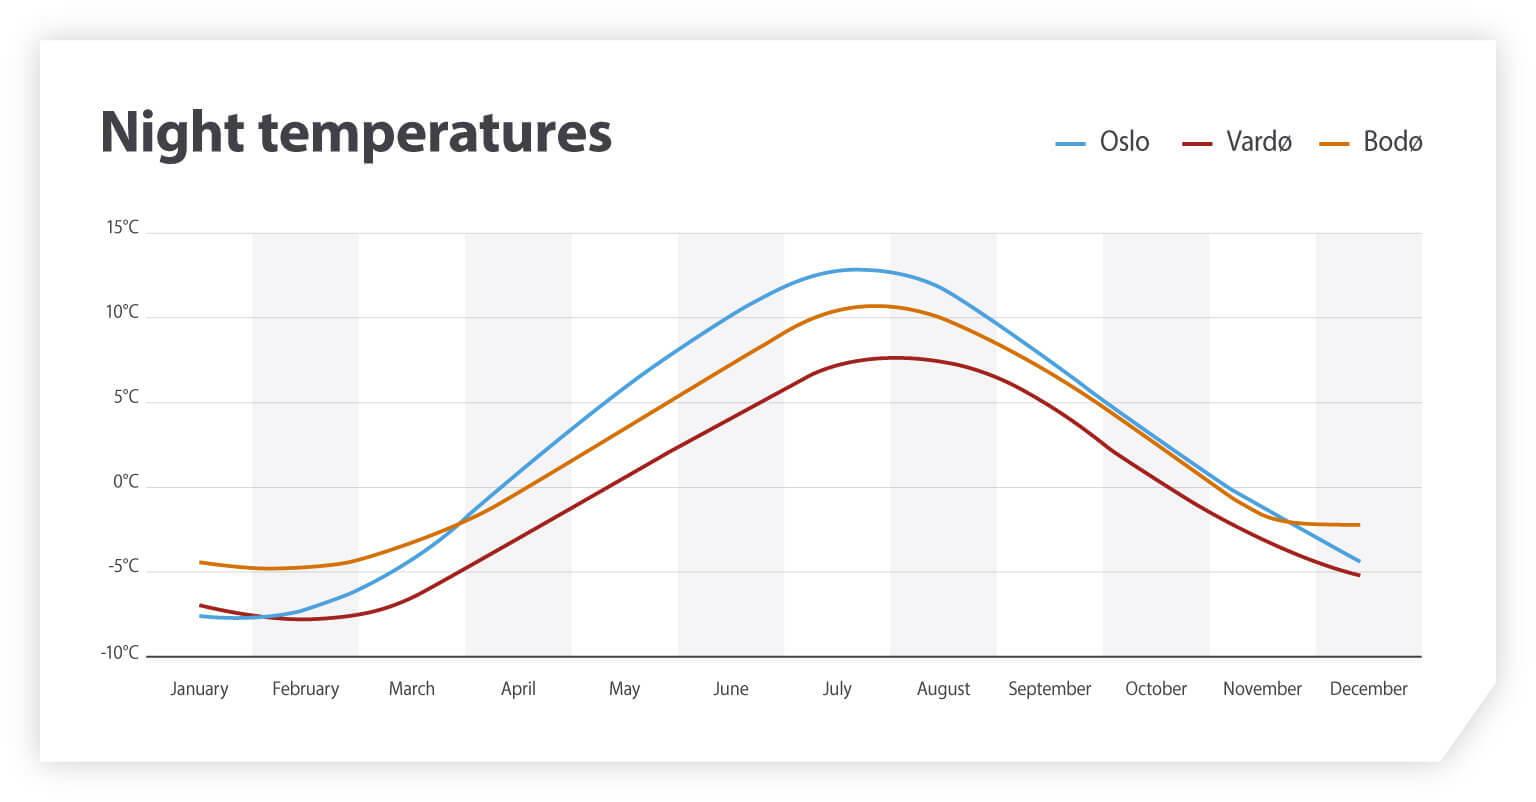 Night temperatures in Norway